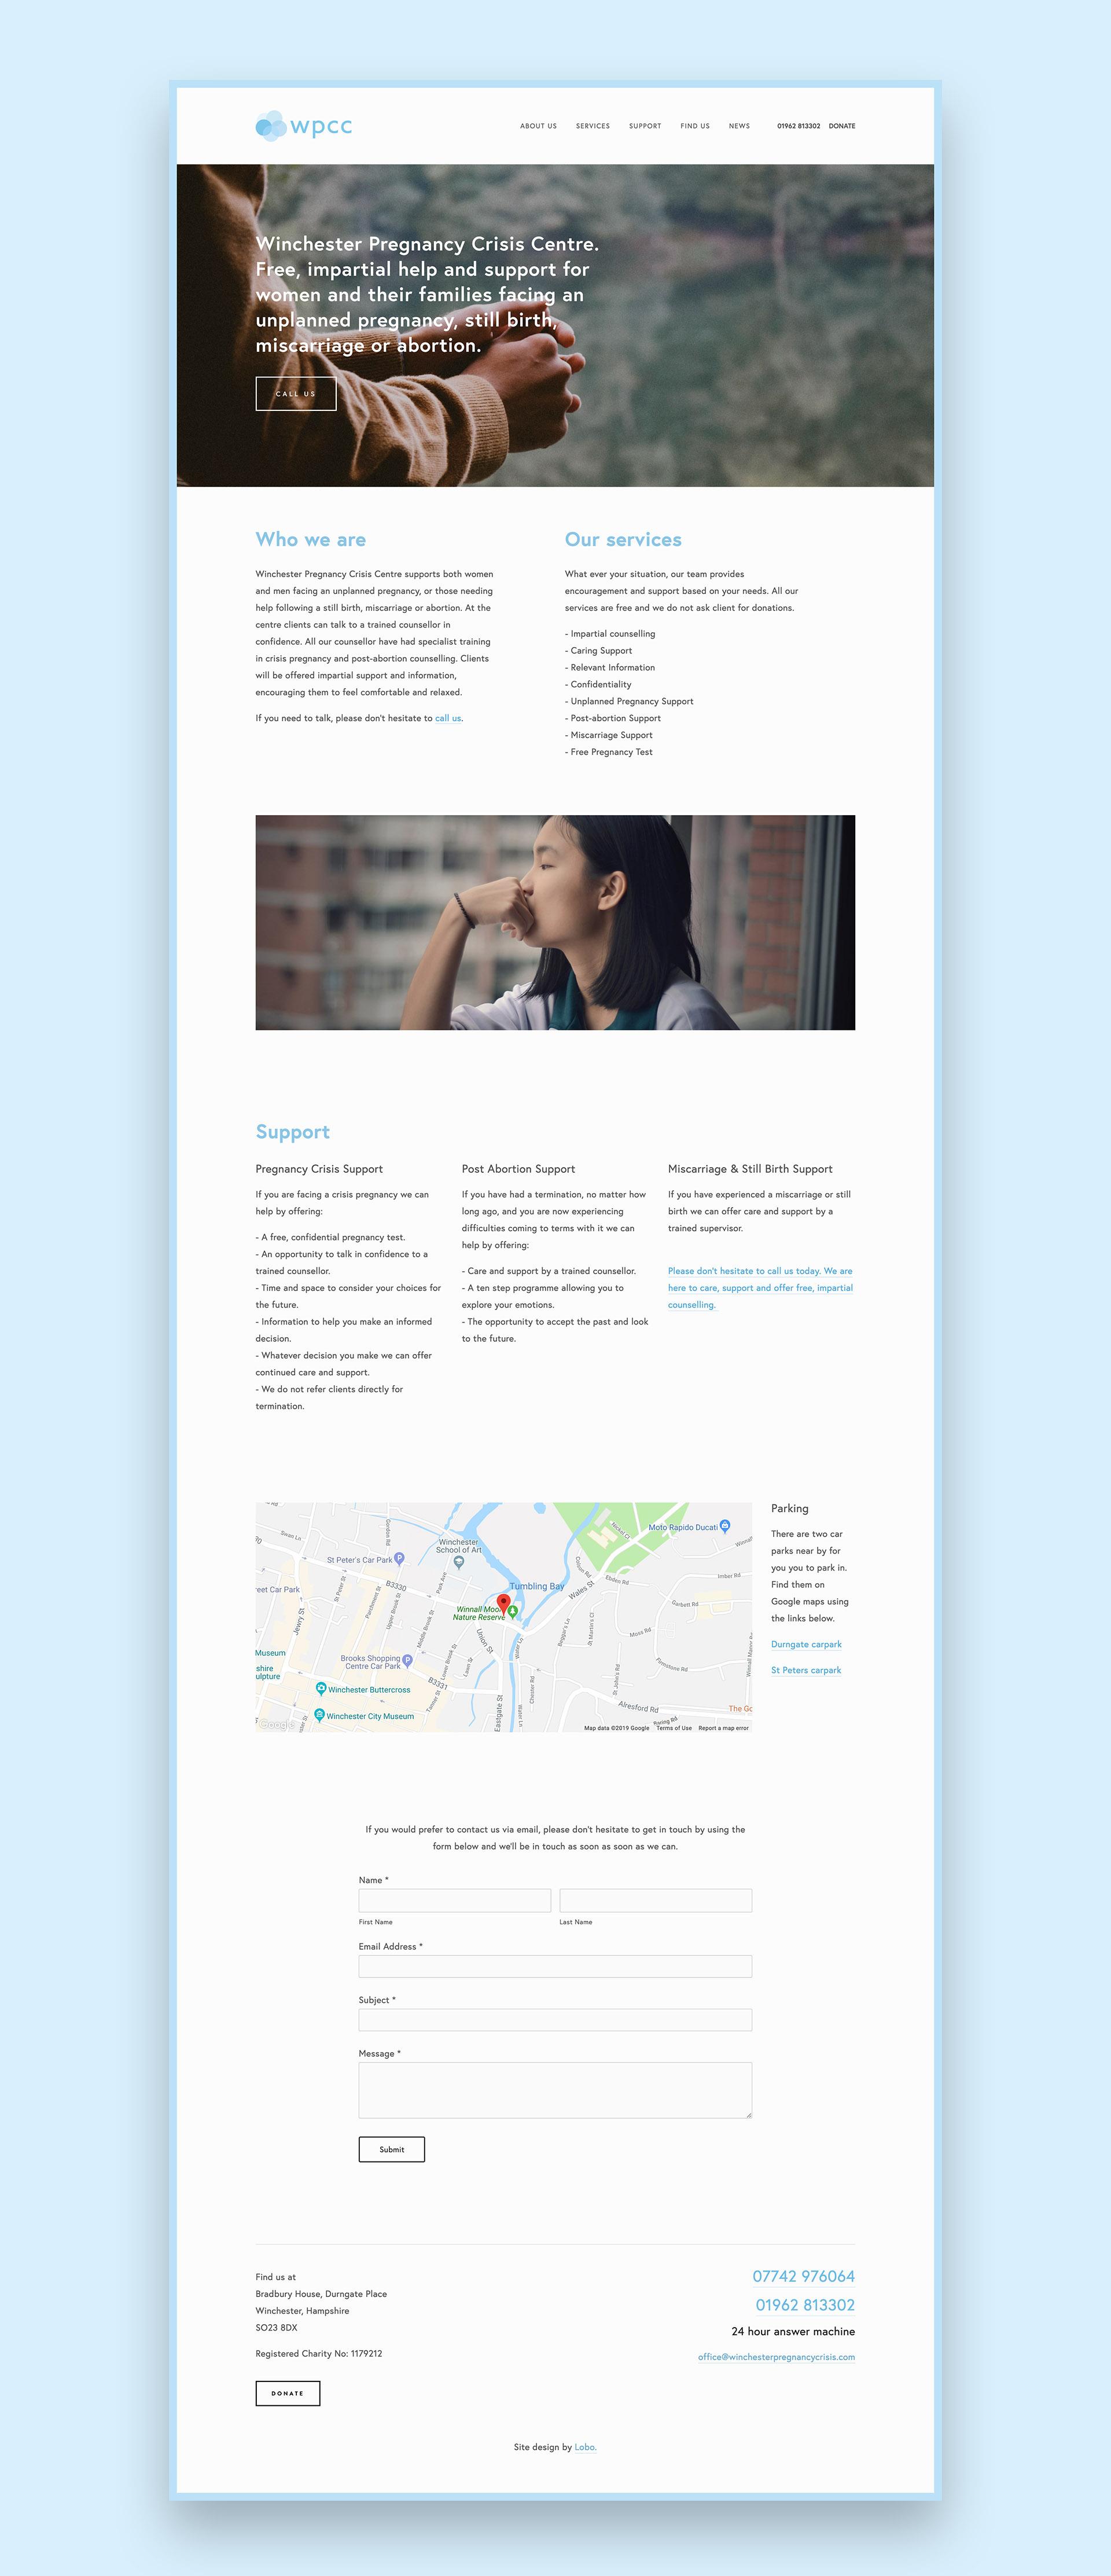 06-Lobo-Creative-Winchester-Pregnancy-Crisis-Centre-charity-website-digital-design-case-study.jpg